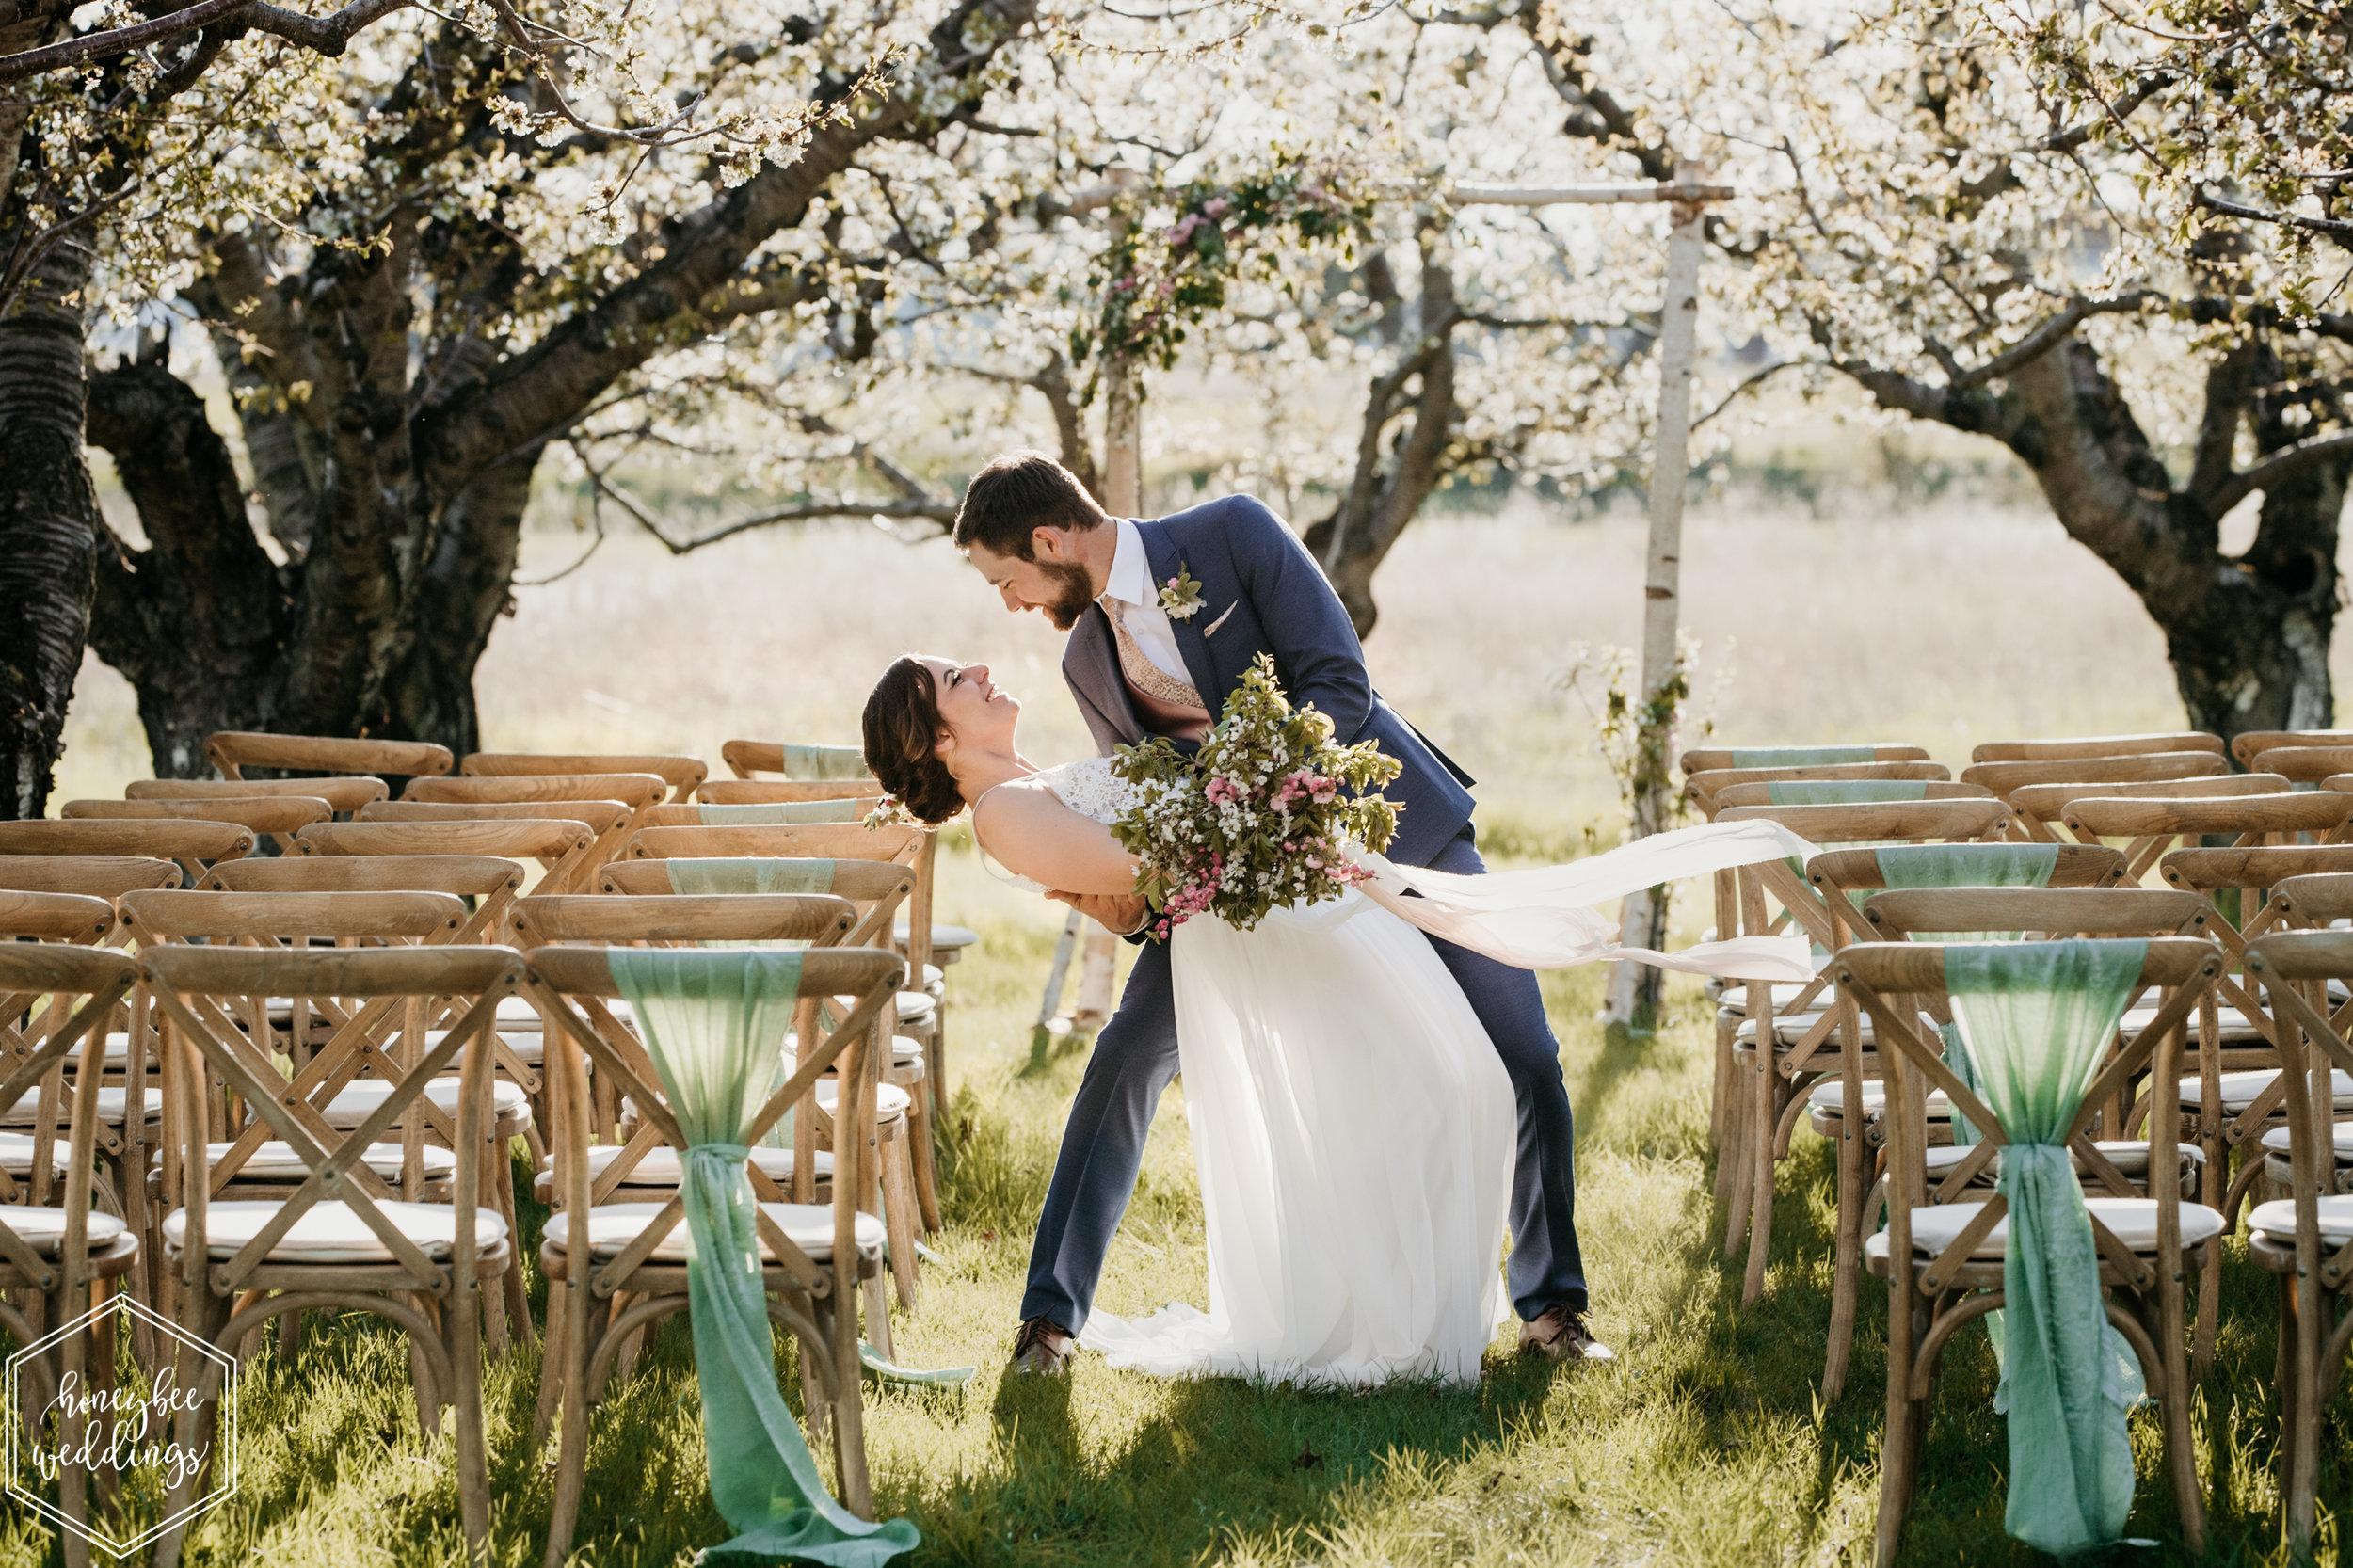 062Cherry Blossom Wedding_Styled Photoshoot_Honeybee Weddings_May 11, 2019-472.jpg